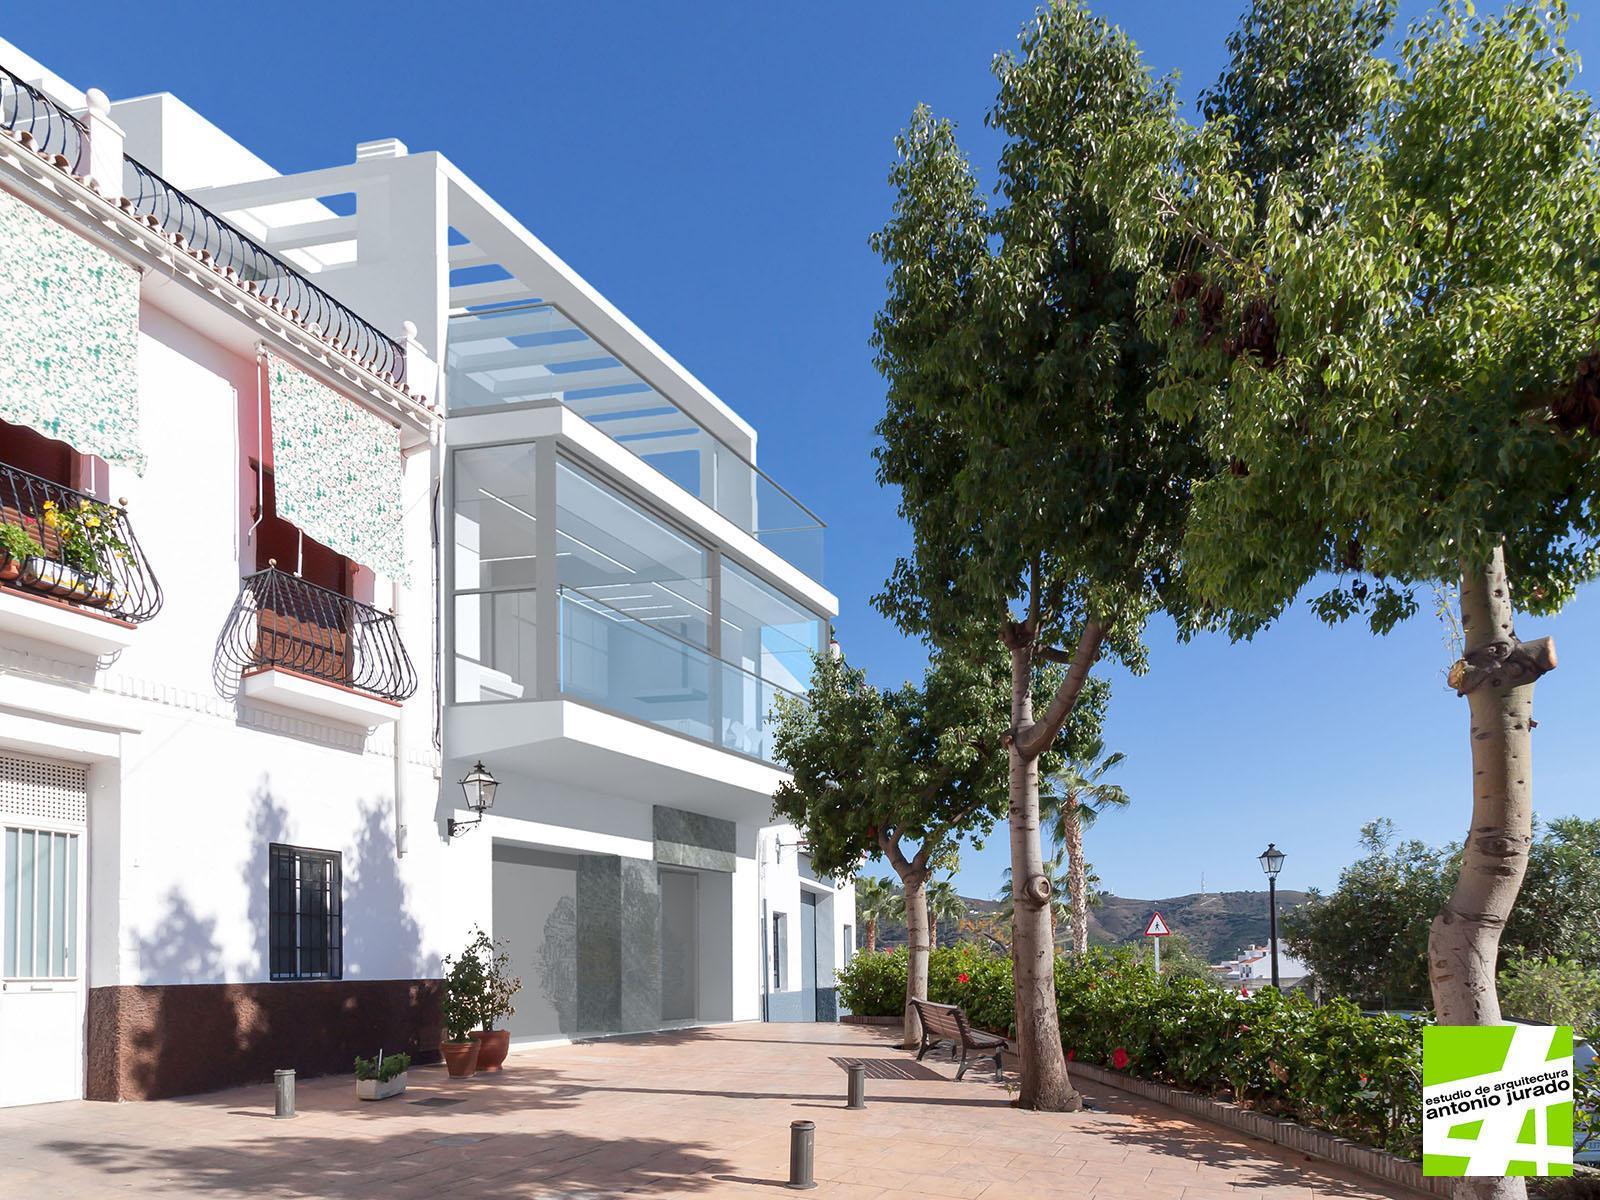 casa-ra-house-torrox-malaga-antonio-jurado-arquitecto-02